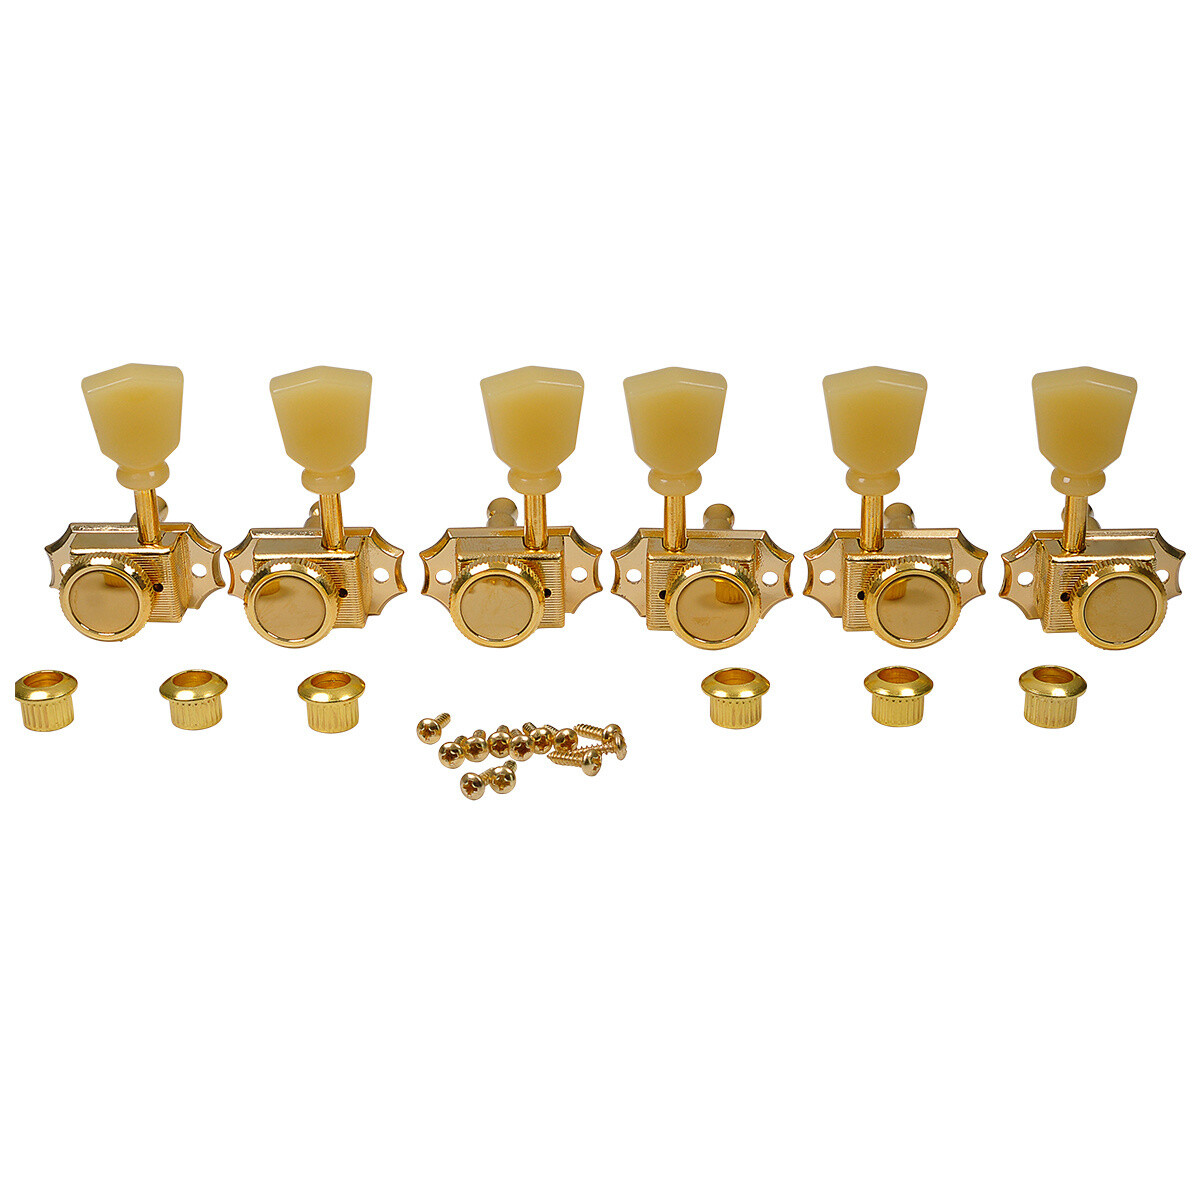 3 x 3 Pro Vintage Hybrid Style Keystone Button Gold - Cream Button